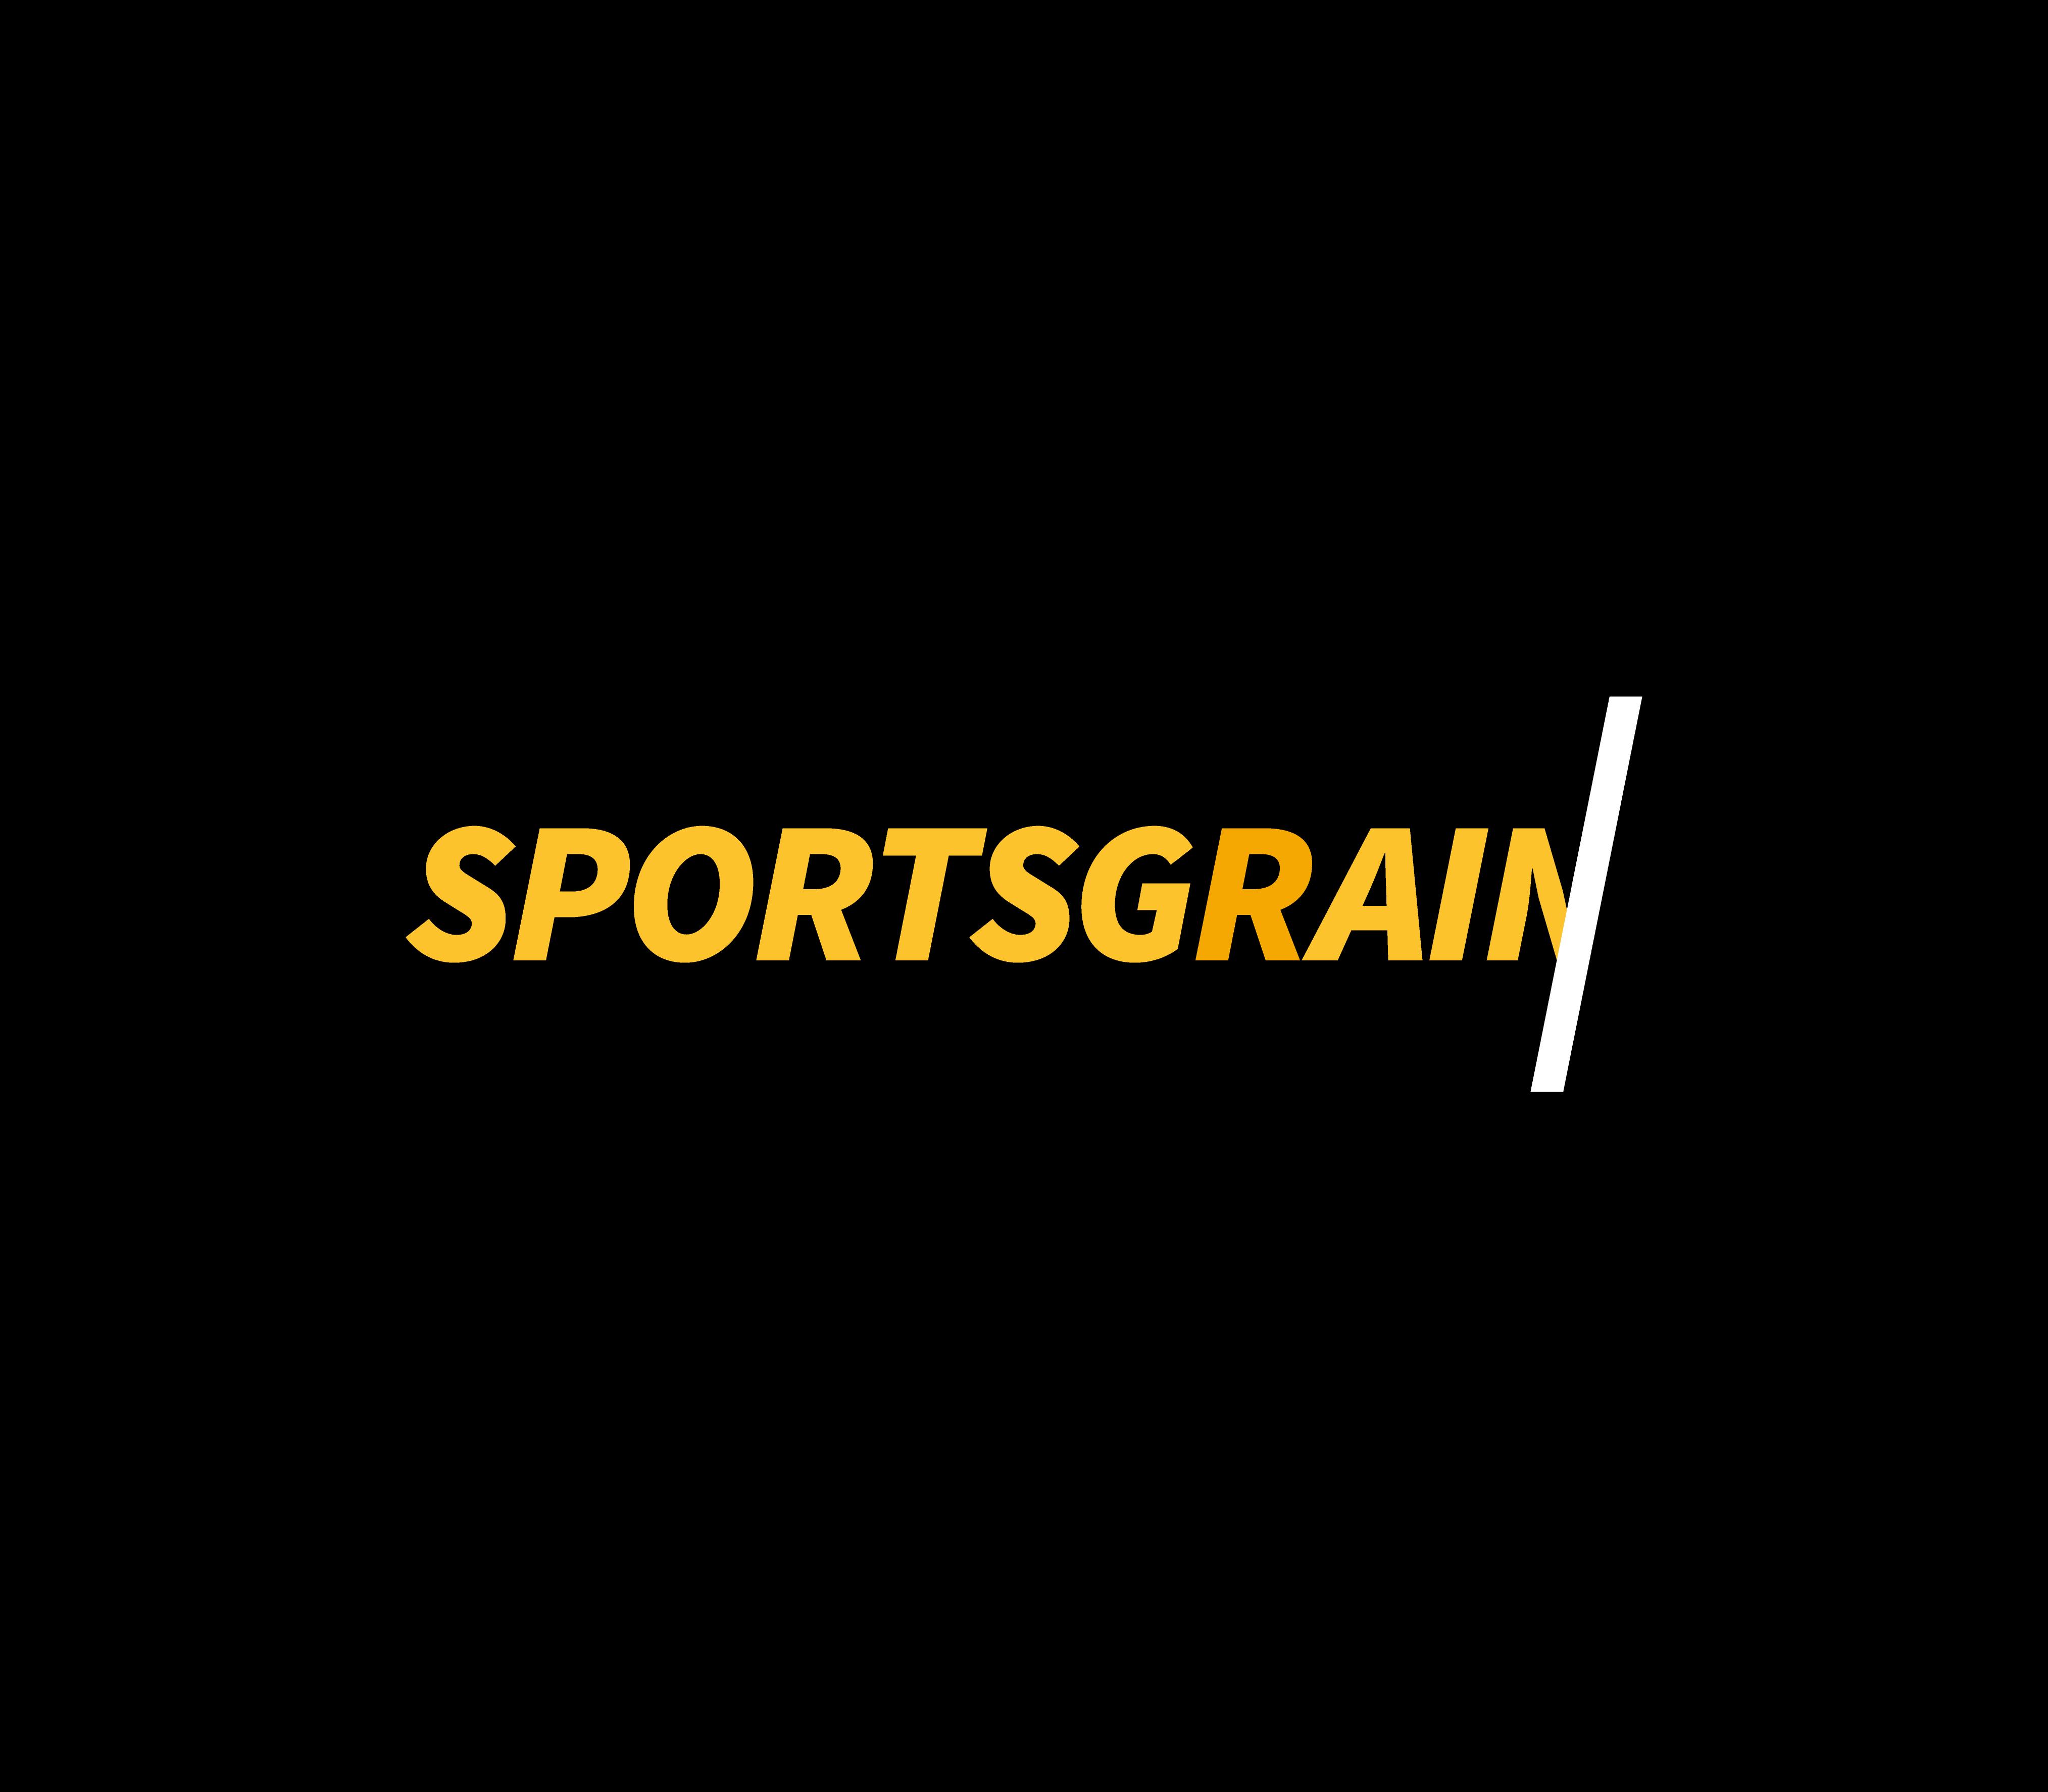 sportsgrain